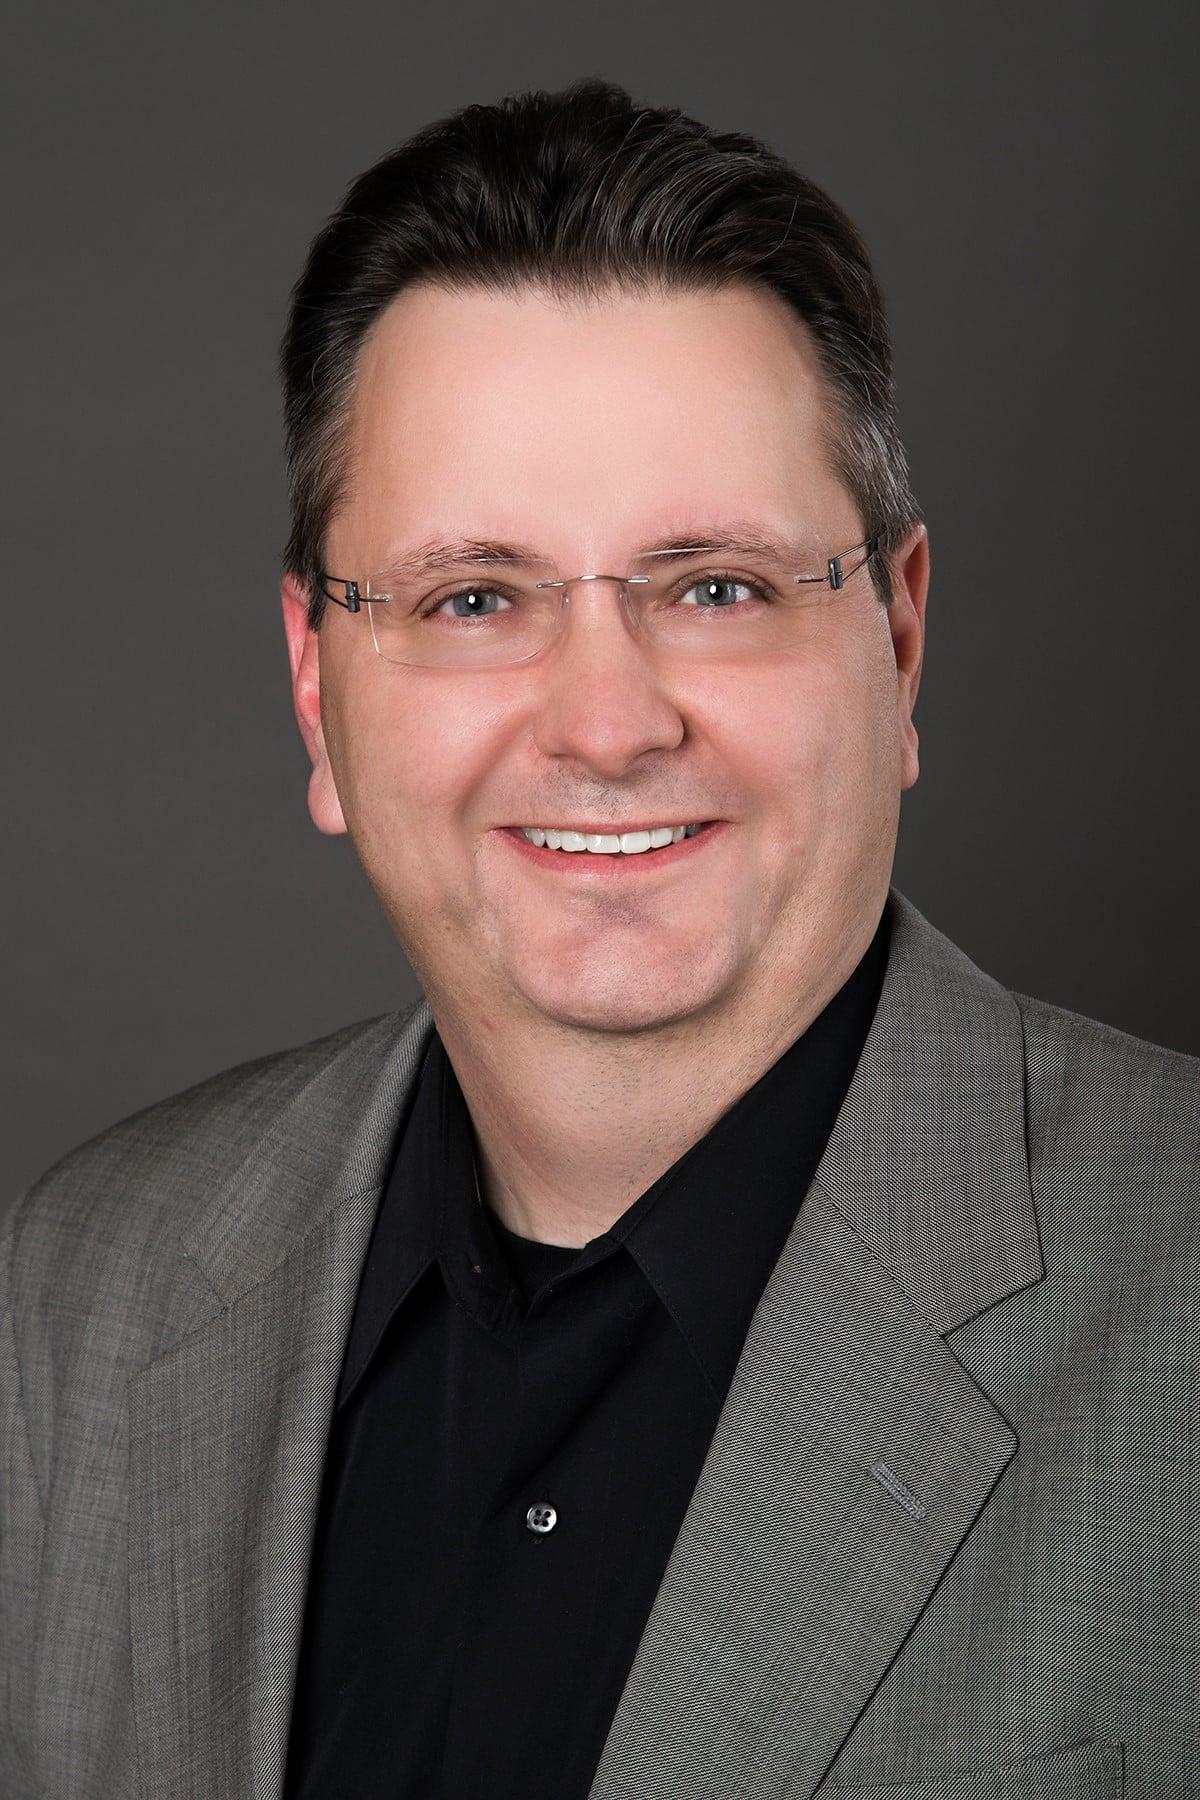 Jeffrey McDonnell